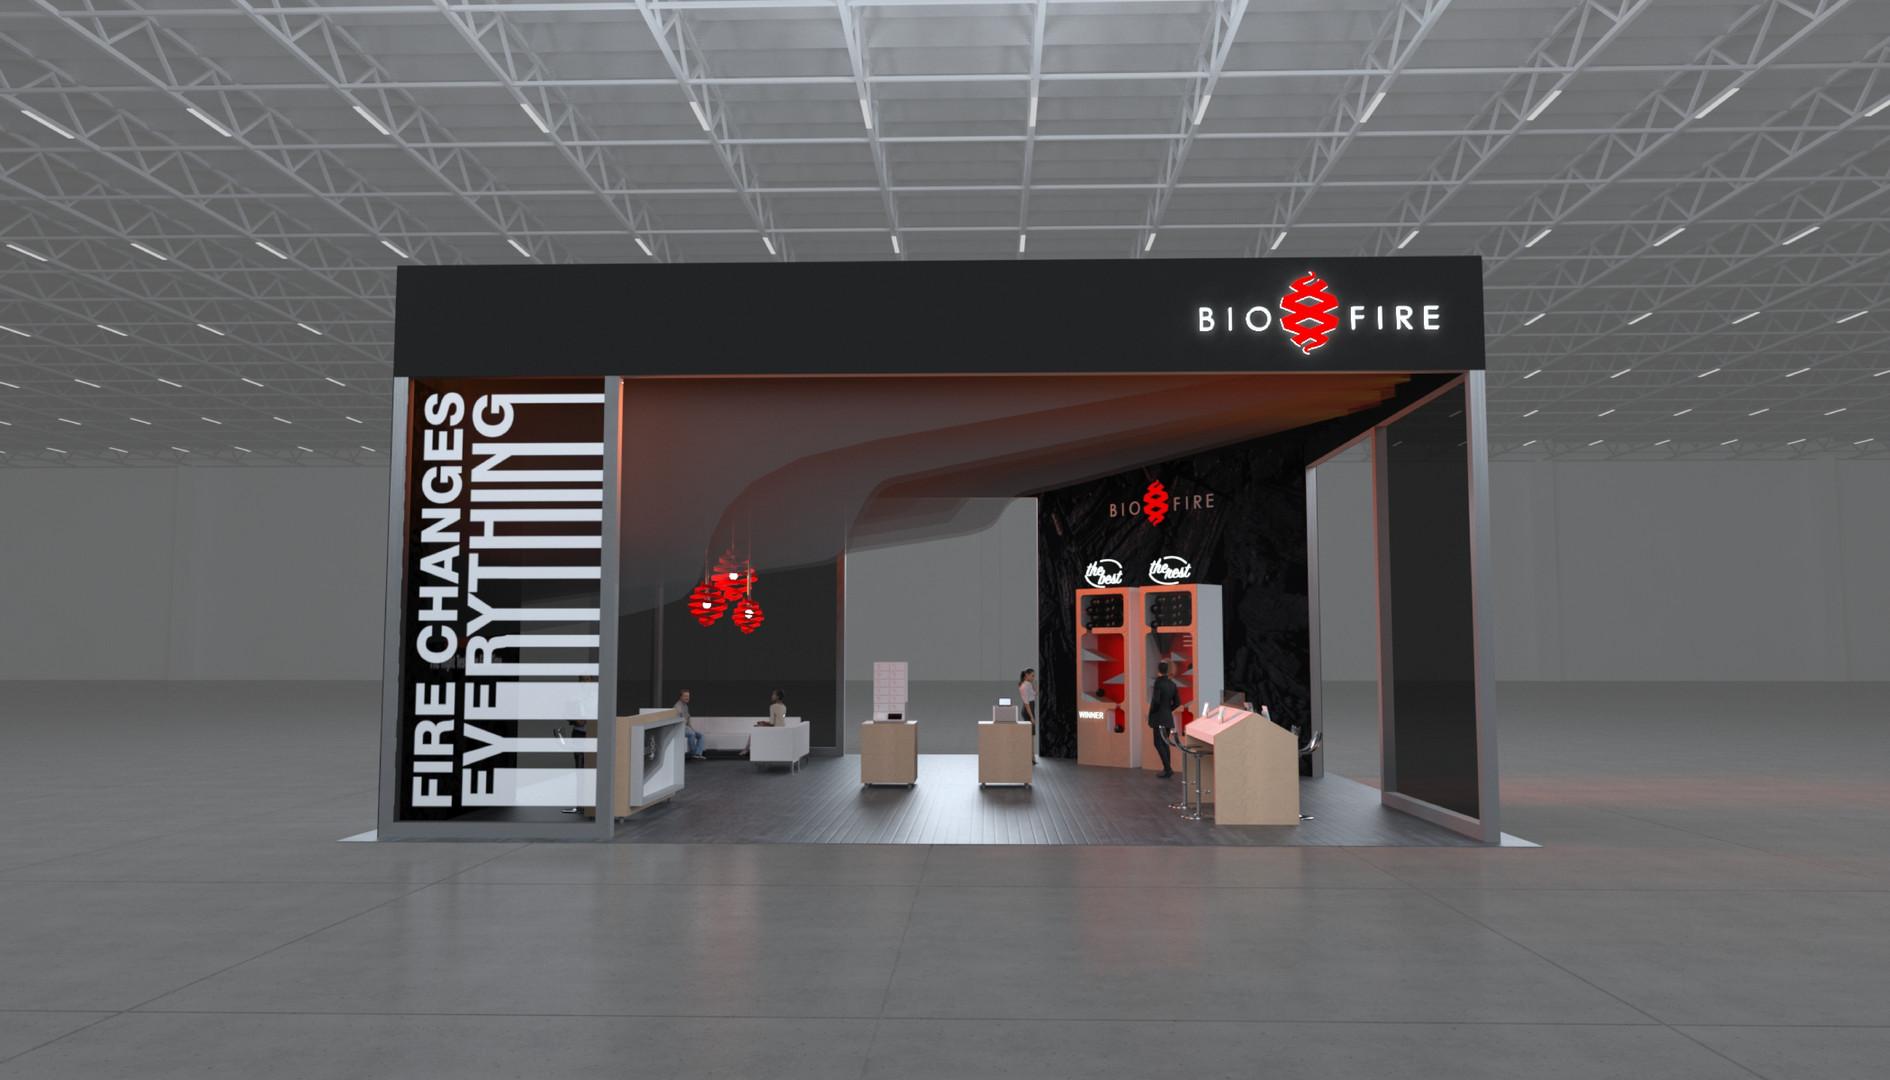 Biofire_front_cropped.jpg